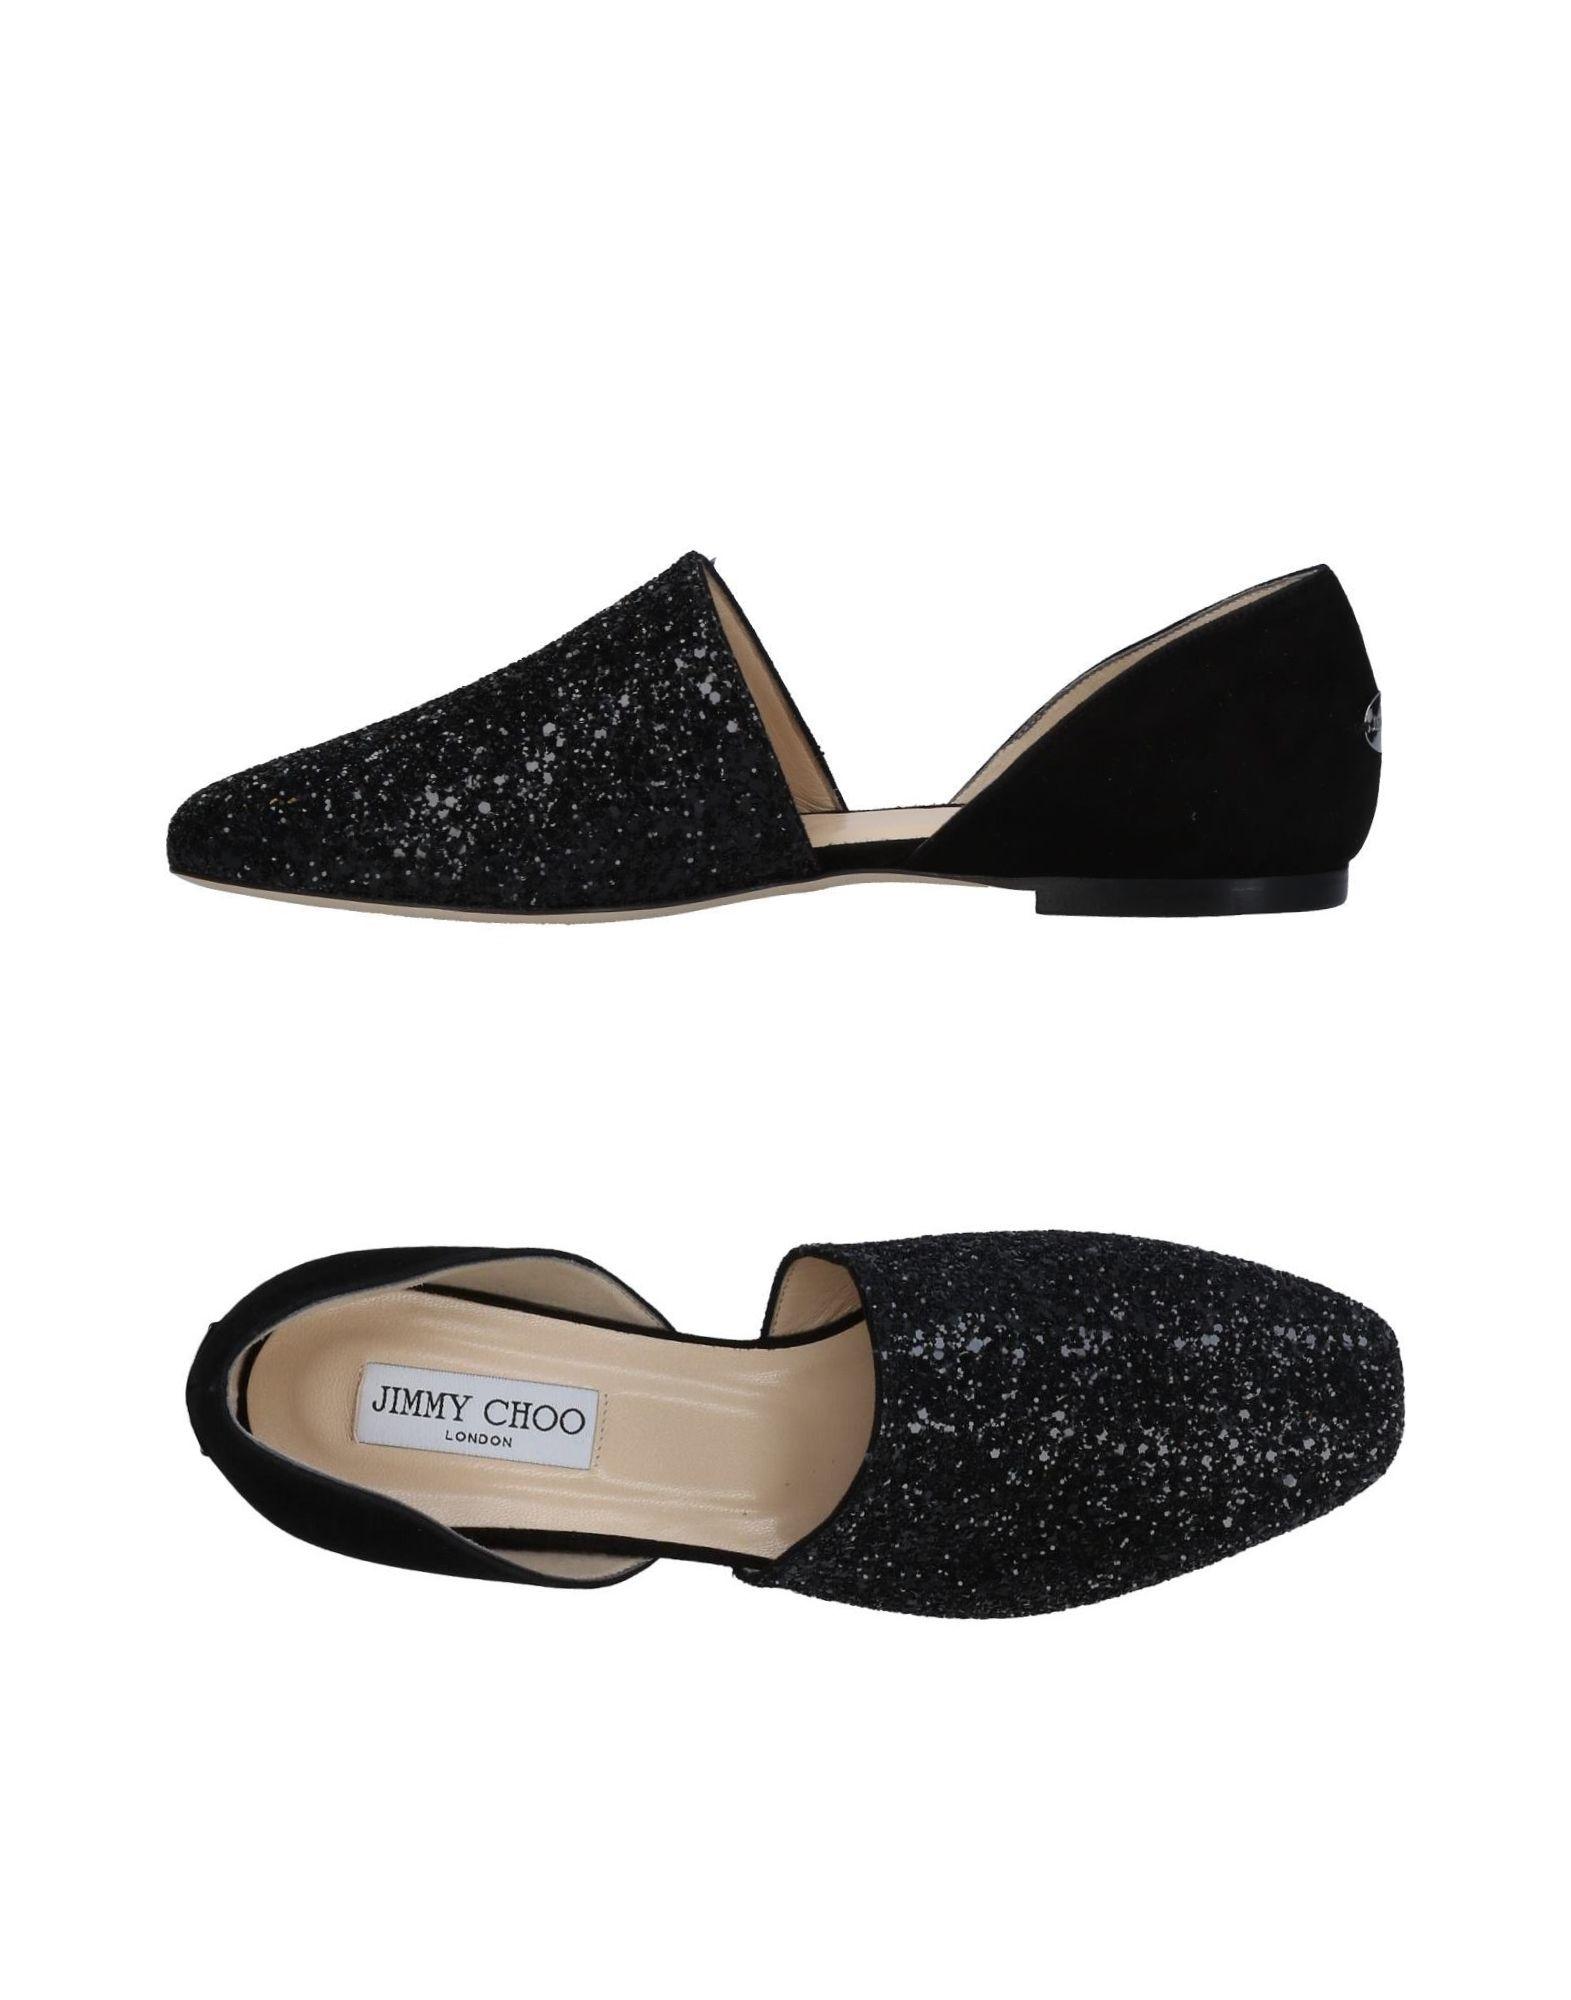 Rabatt Schuhe Mokassins Jimmy Choo Mokassins Schuhe Damen  11460076UD 7a5a9f